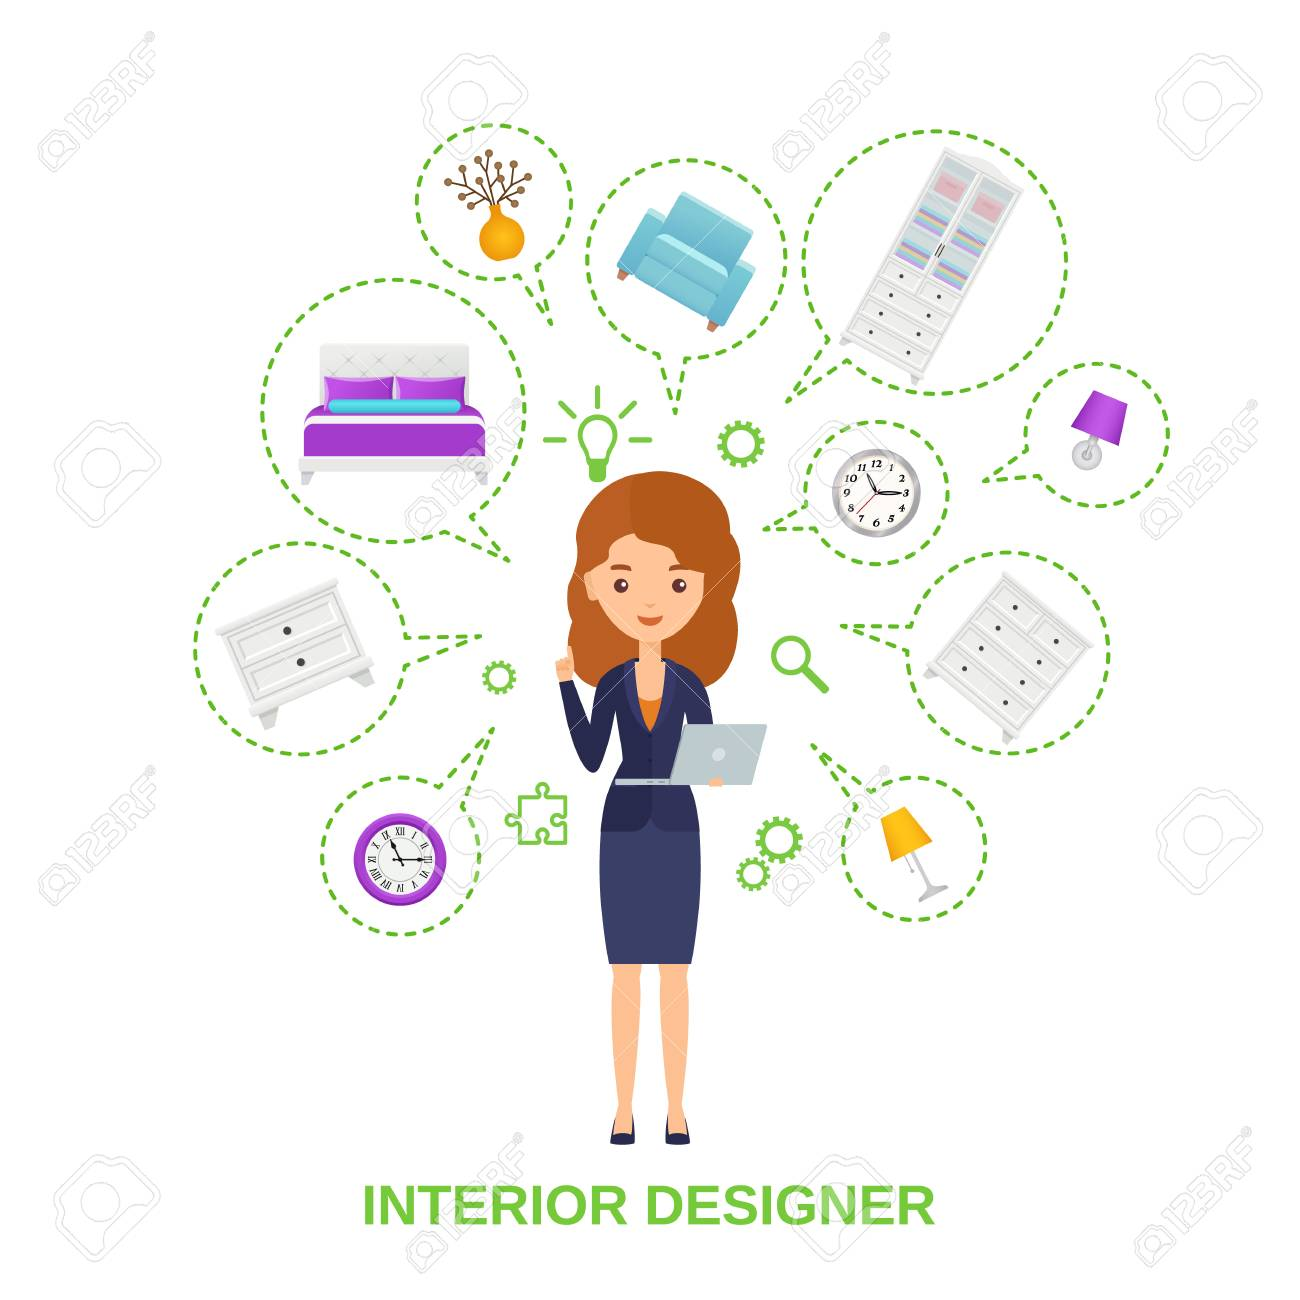 Female interior designer with furniture around in speech bubbles.